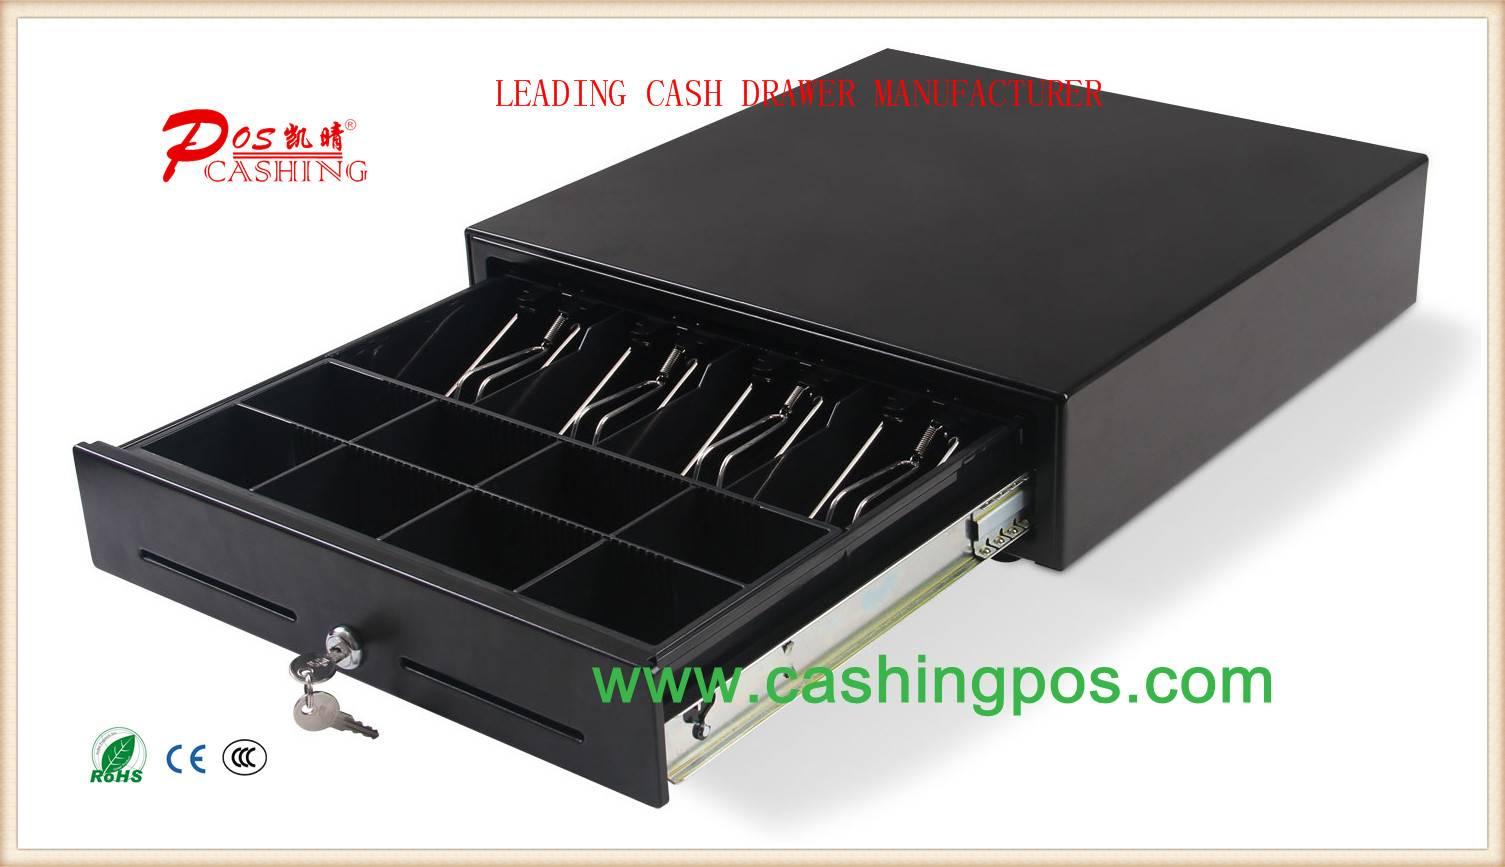 QS-410 Slide Cash Drawer